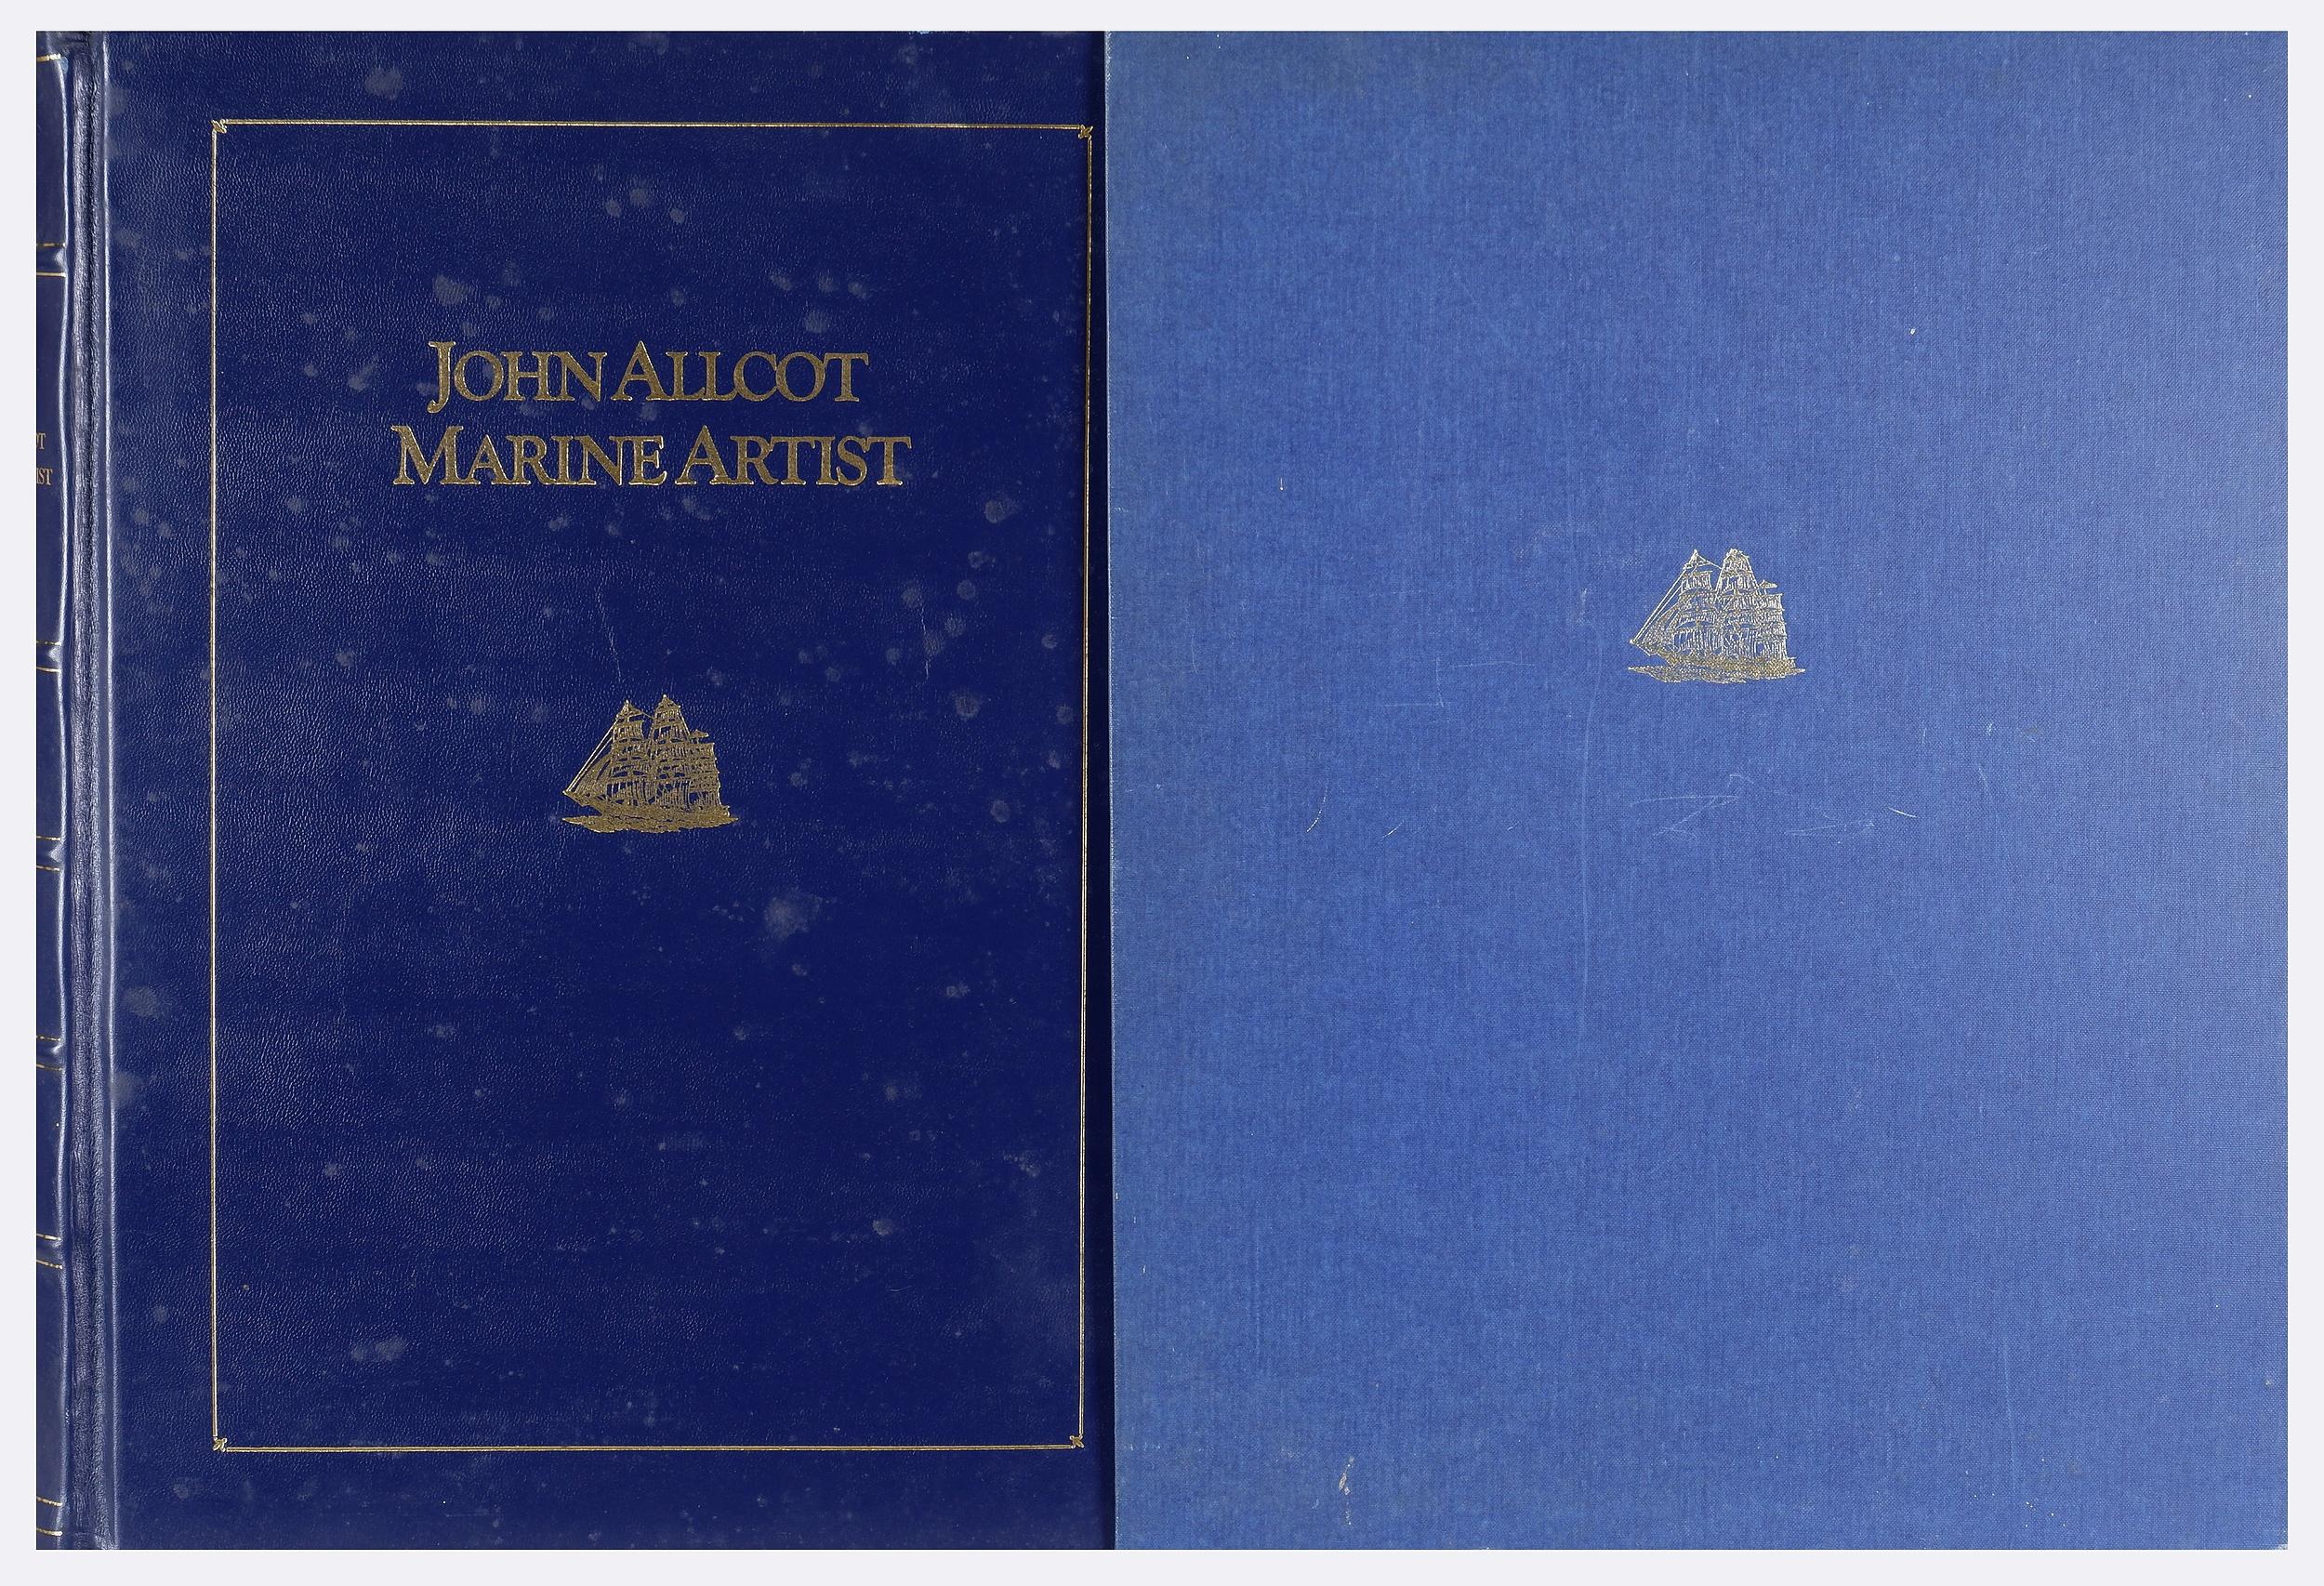 'John Alcott Marine Artist, Macarthur Press, Sydney 1978 '